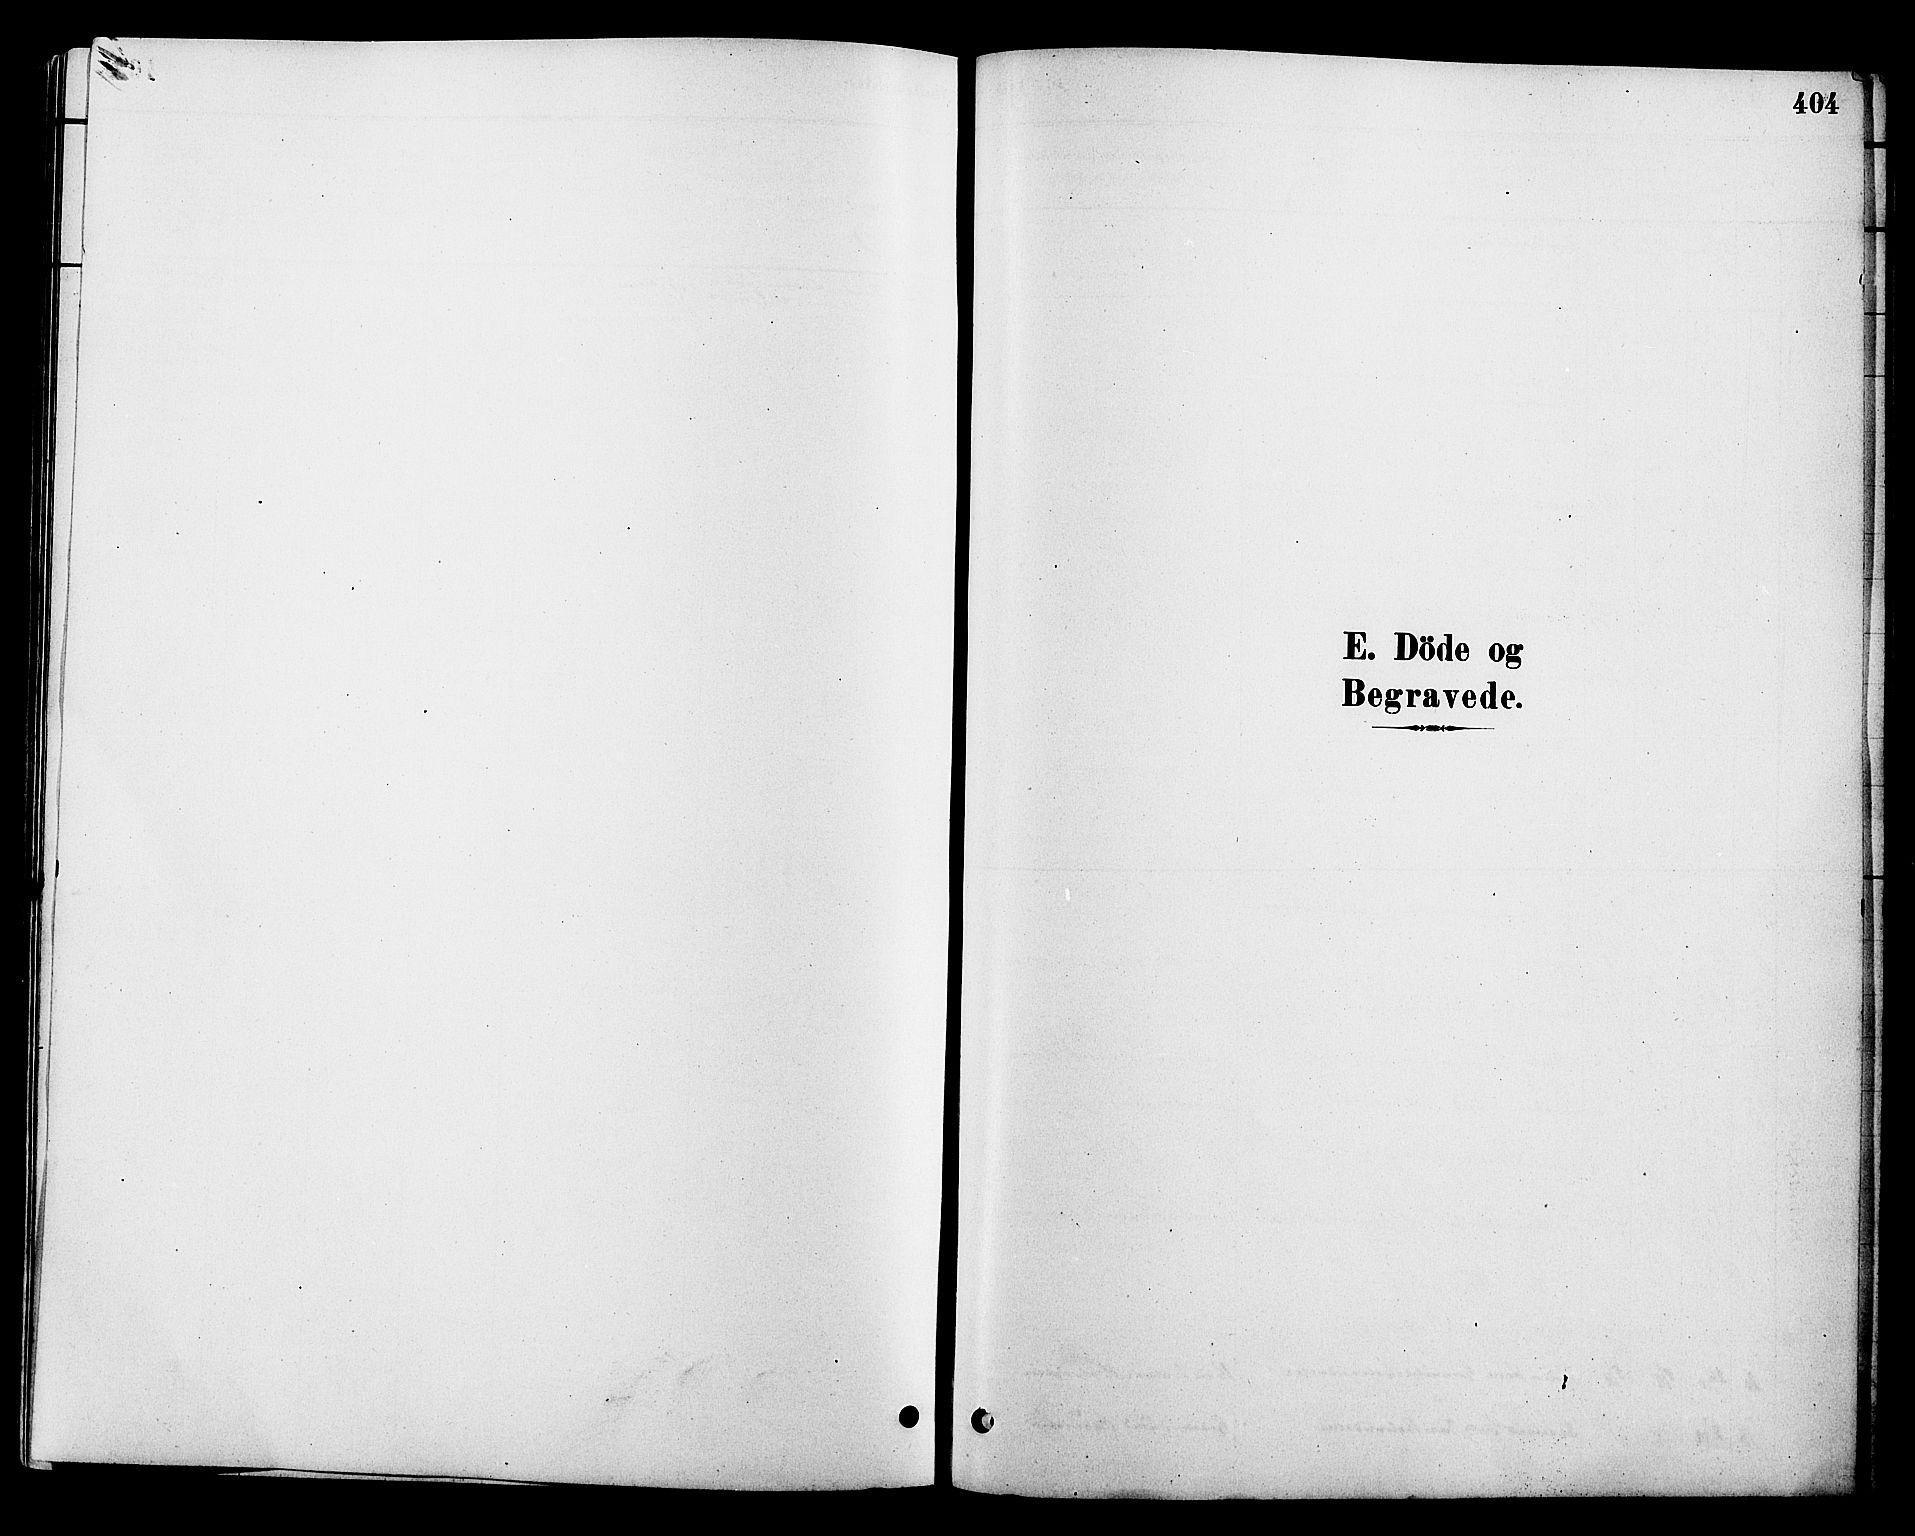 SAKO, Heddal kirkebøker, G/Ga/L0002: Klokkerbok nr. I 2, 1879-1908, s. 404